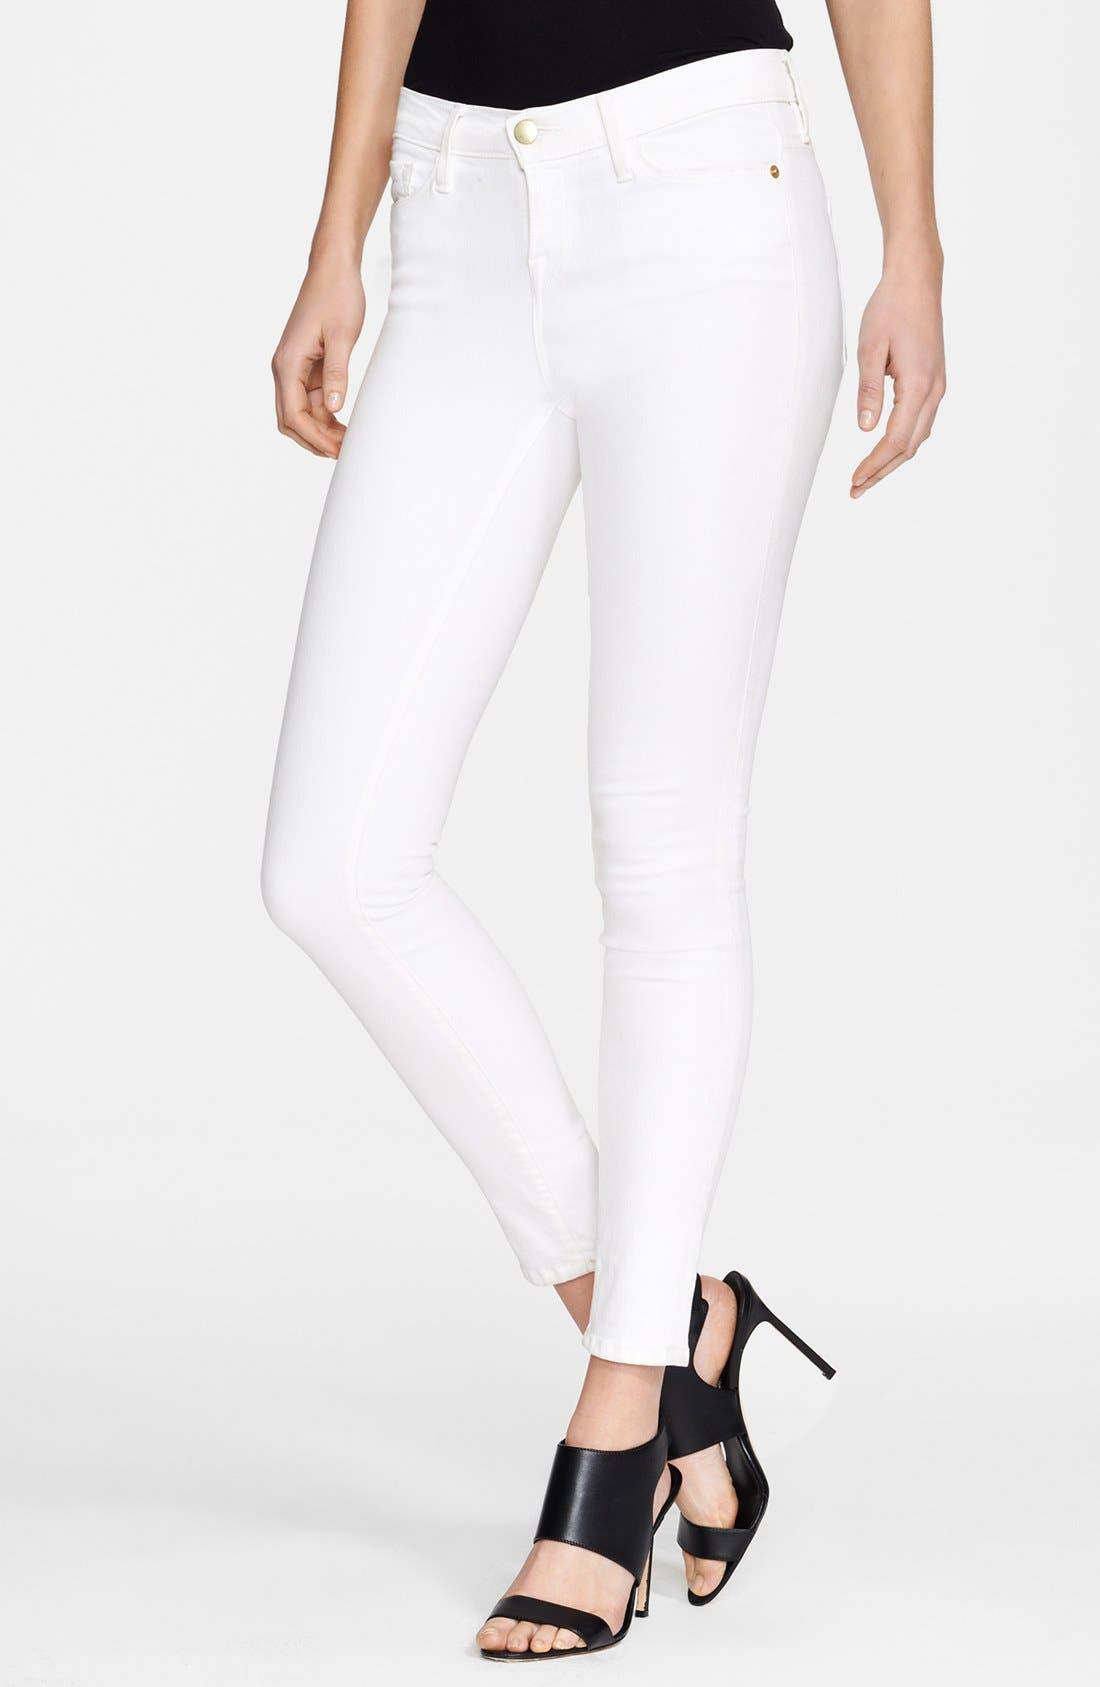 FRAME, Le Color Skinny Jeans, Main thumbnail 1, color, BLANC